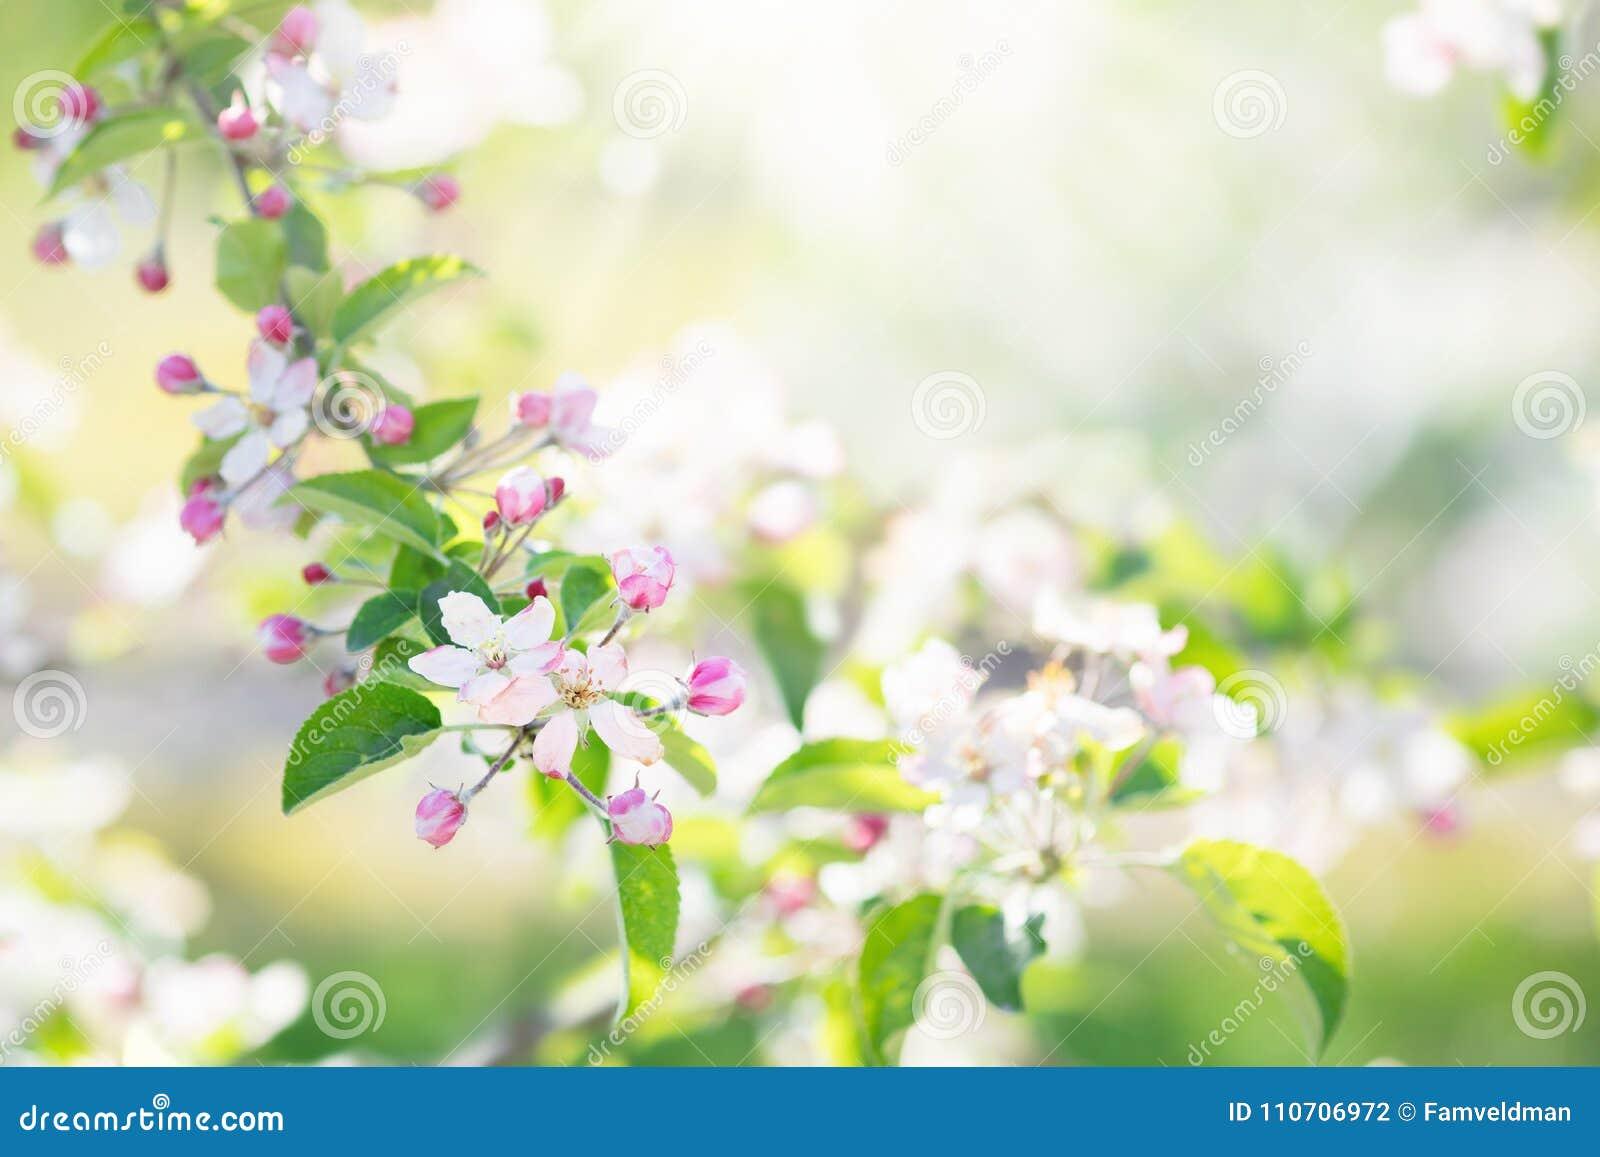 Blooming Cherry Blossom Spring Flower In Garden Stock Photo